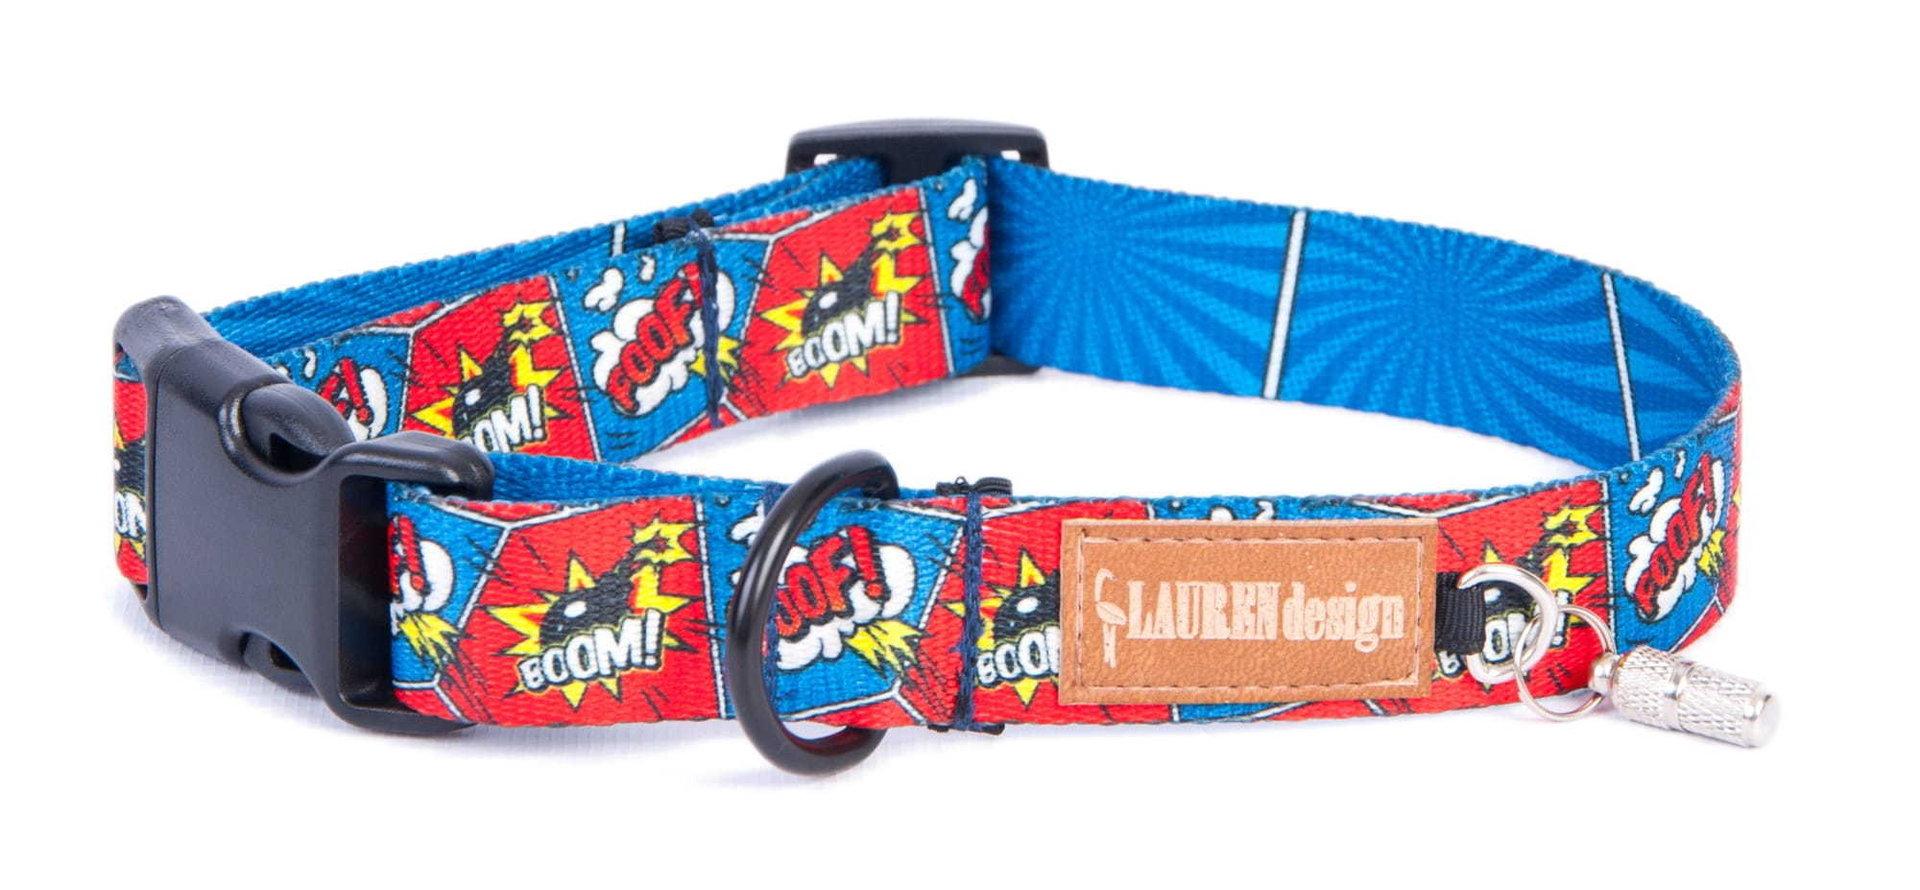 Halsband, Foof/boom, S - XL